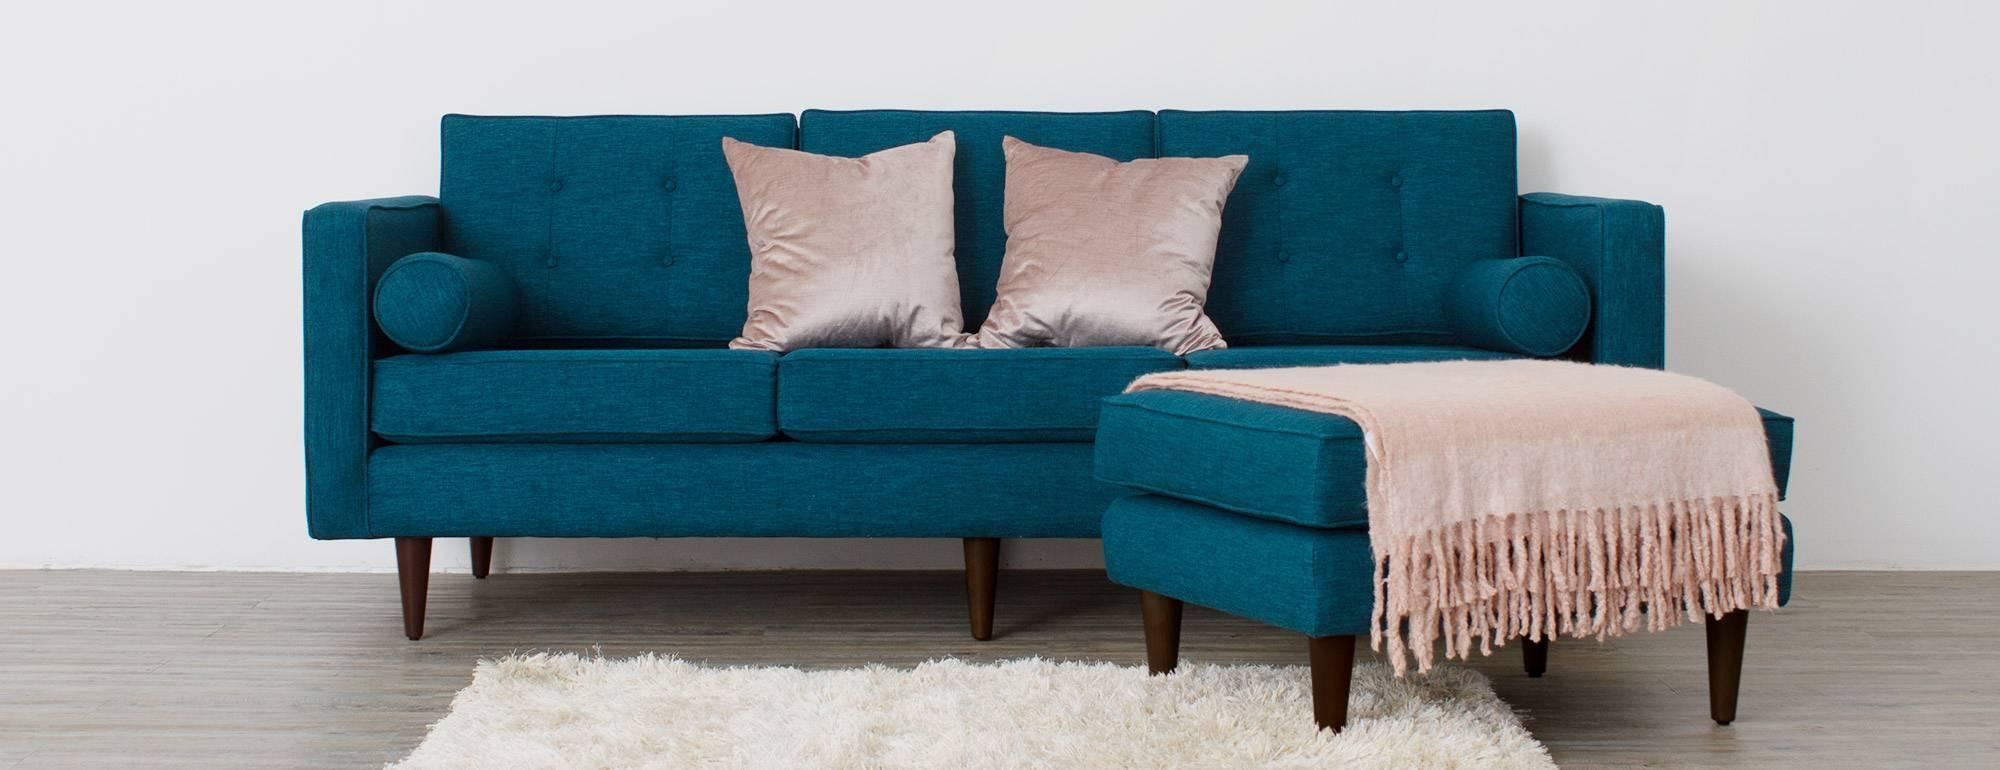 Braxton Sofa | Joybird within Braxton Sofa (Image 25 of 30)